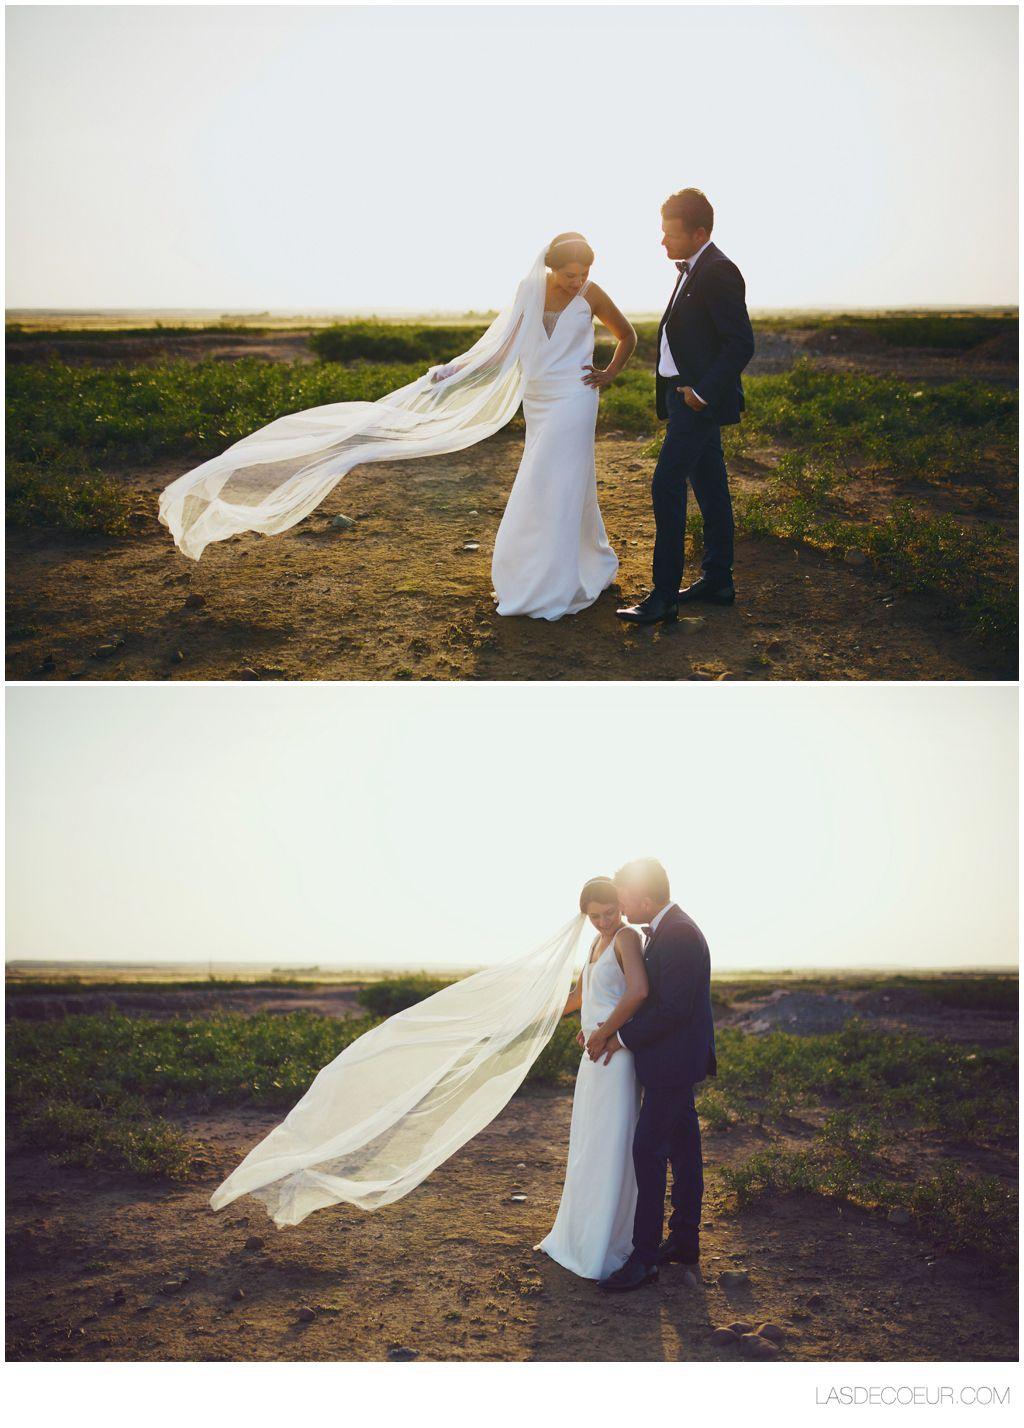 images Married in Marrakech: Jane Lerman Shane Fonners Desert Wedding